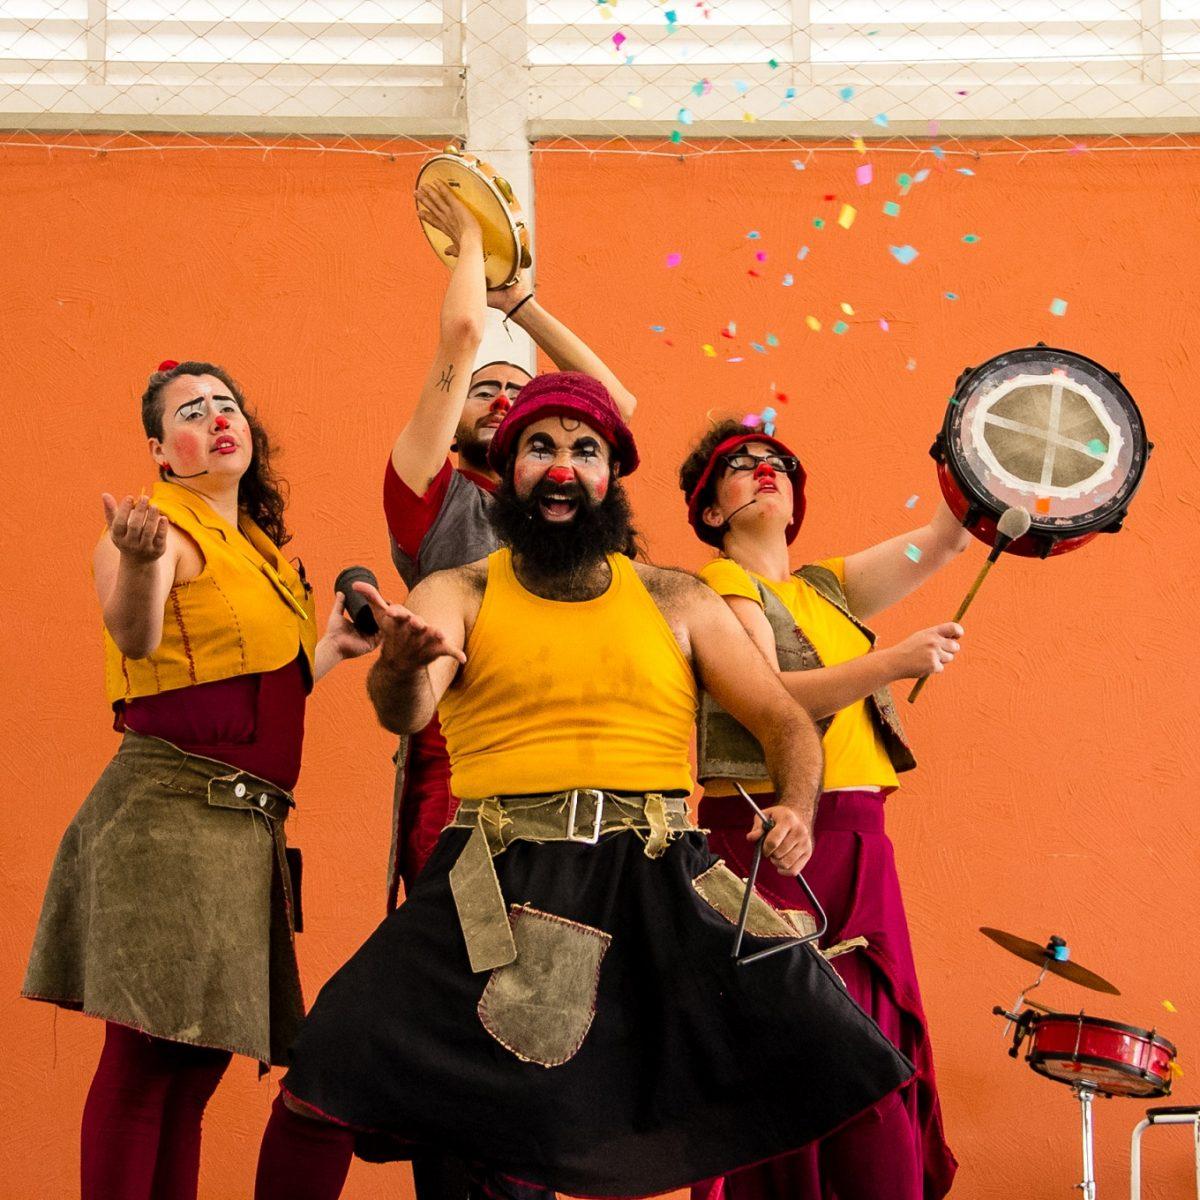 Projeto Respeitável Público leva o Circo ao Centro da Cidade dia 18 de maio